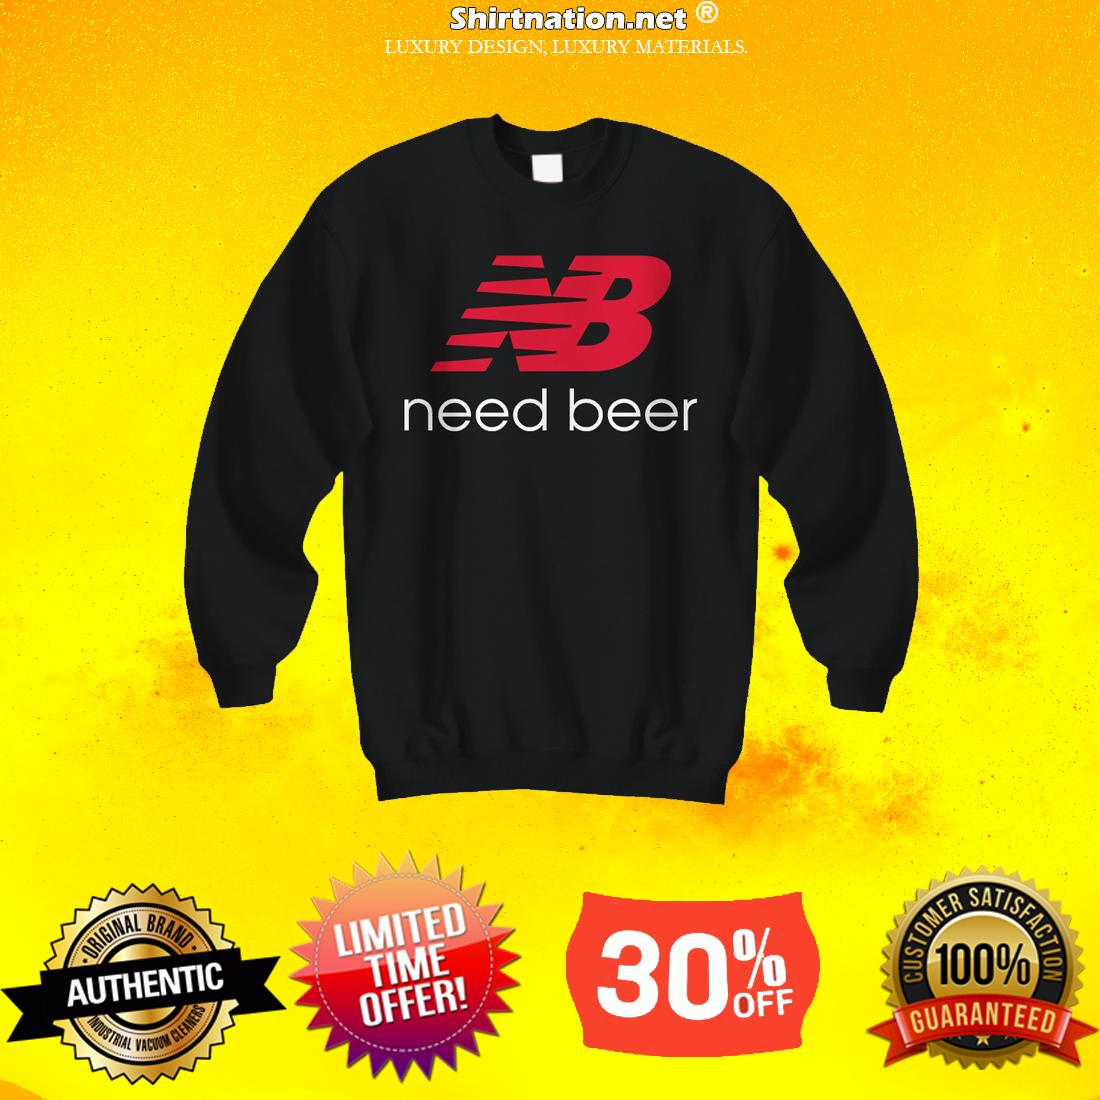 New balance need beer sweatshirt